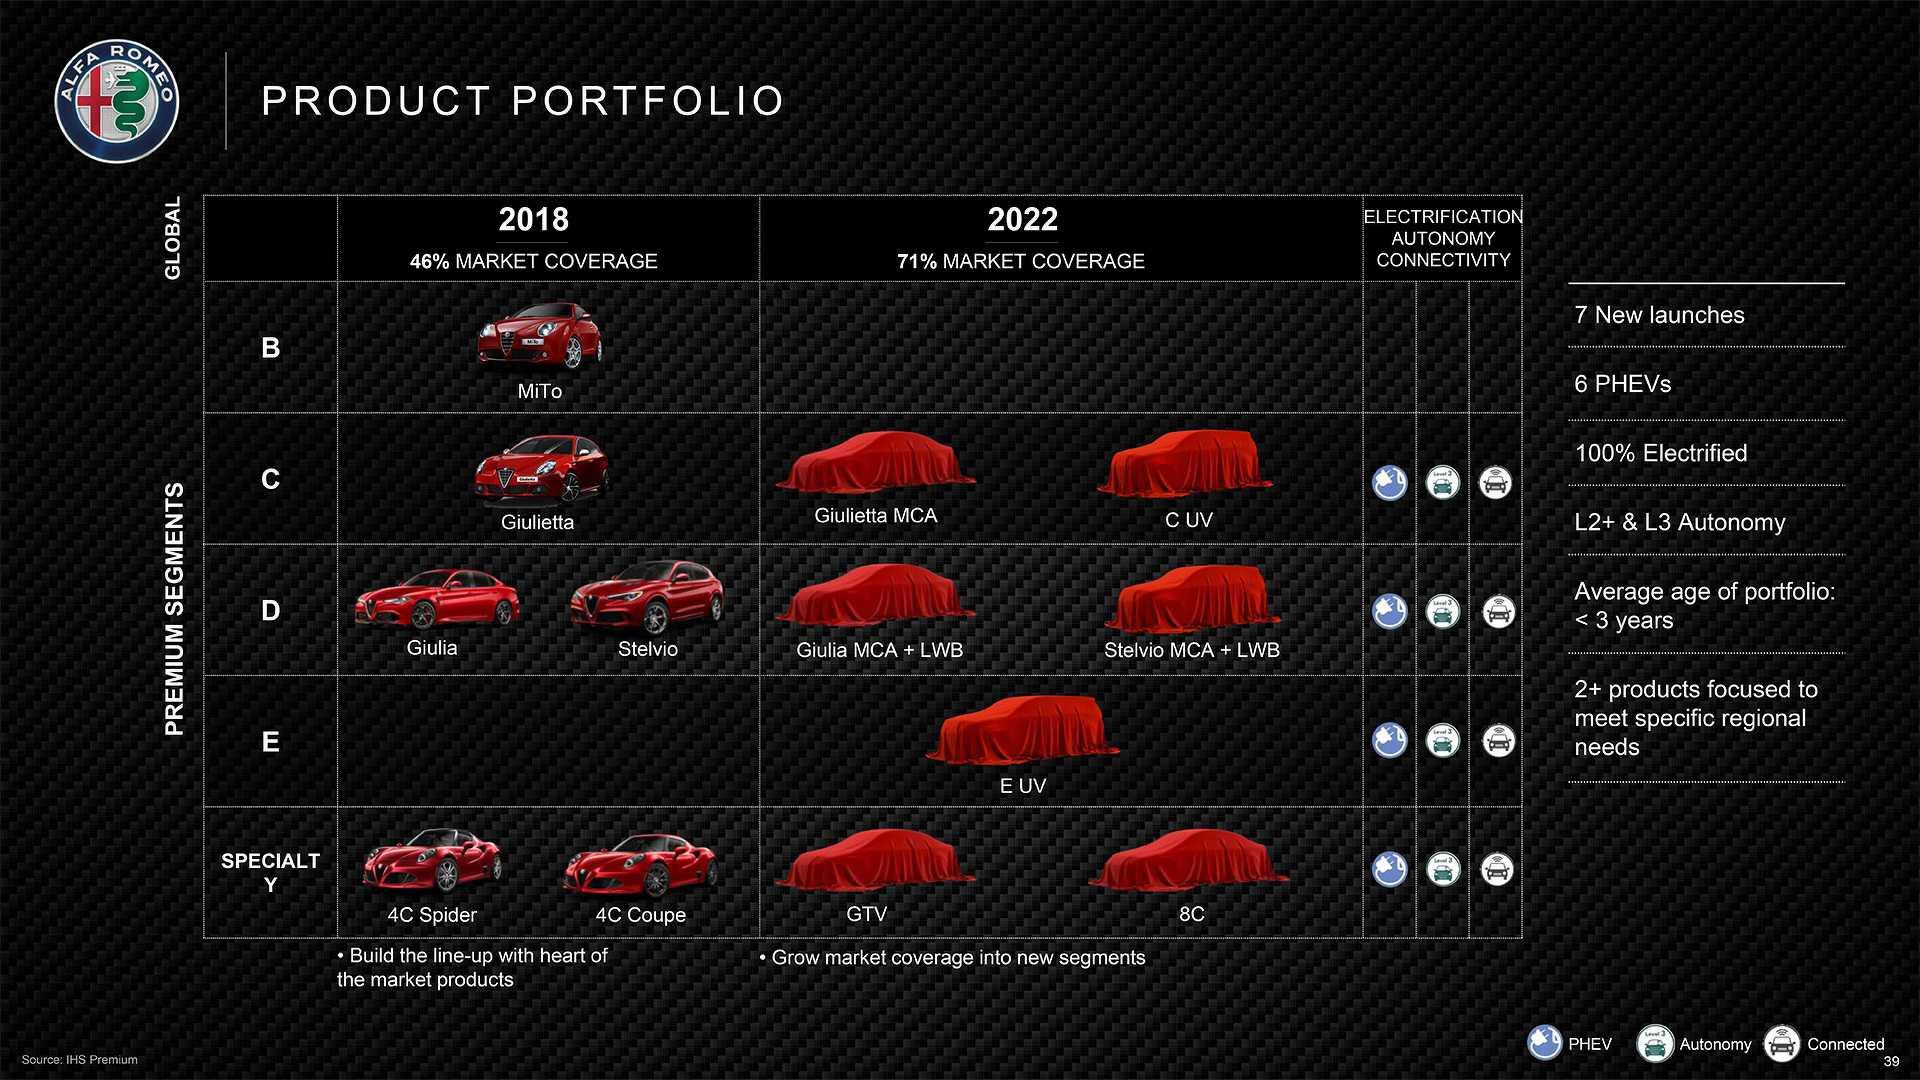 alfa romeo 2018 2022 roadmap officially revealed 8c gtv to return